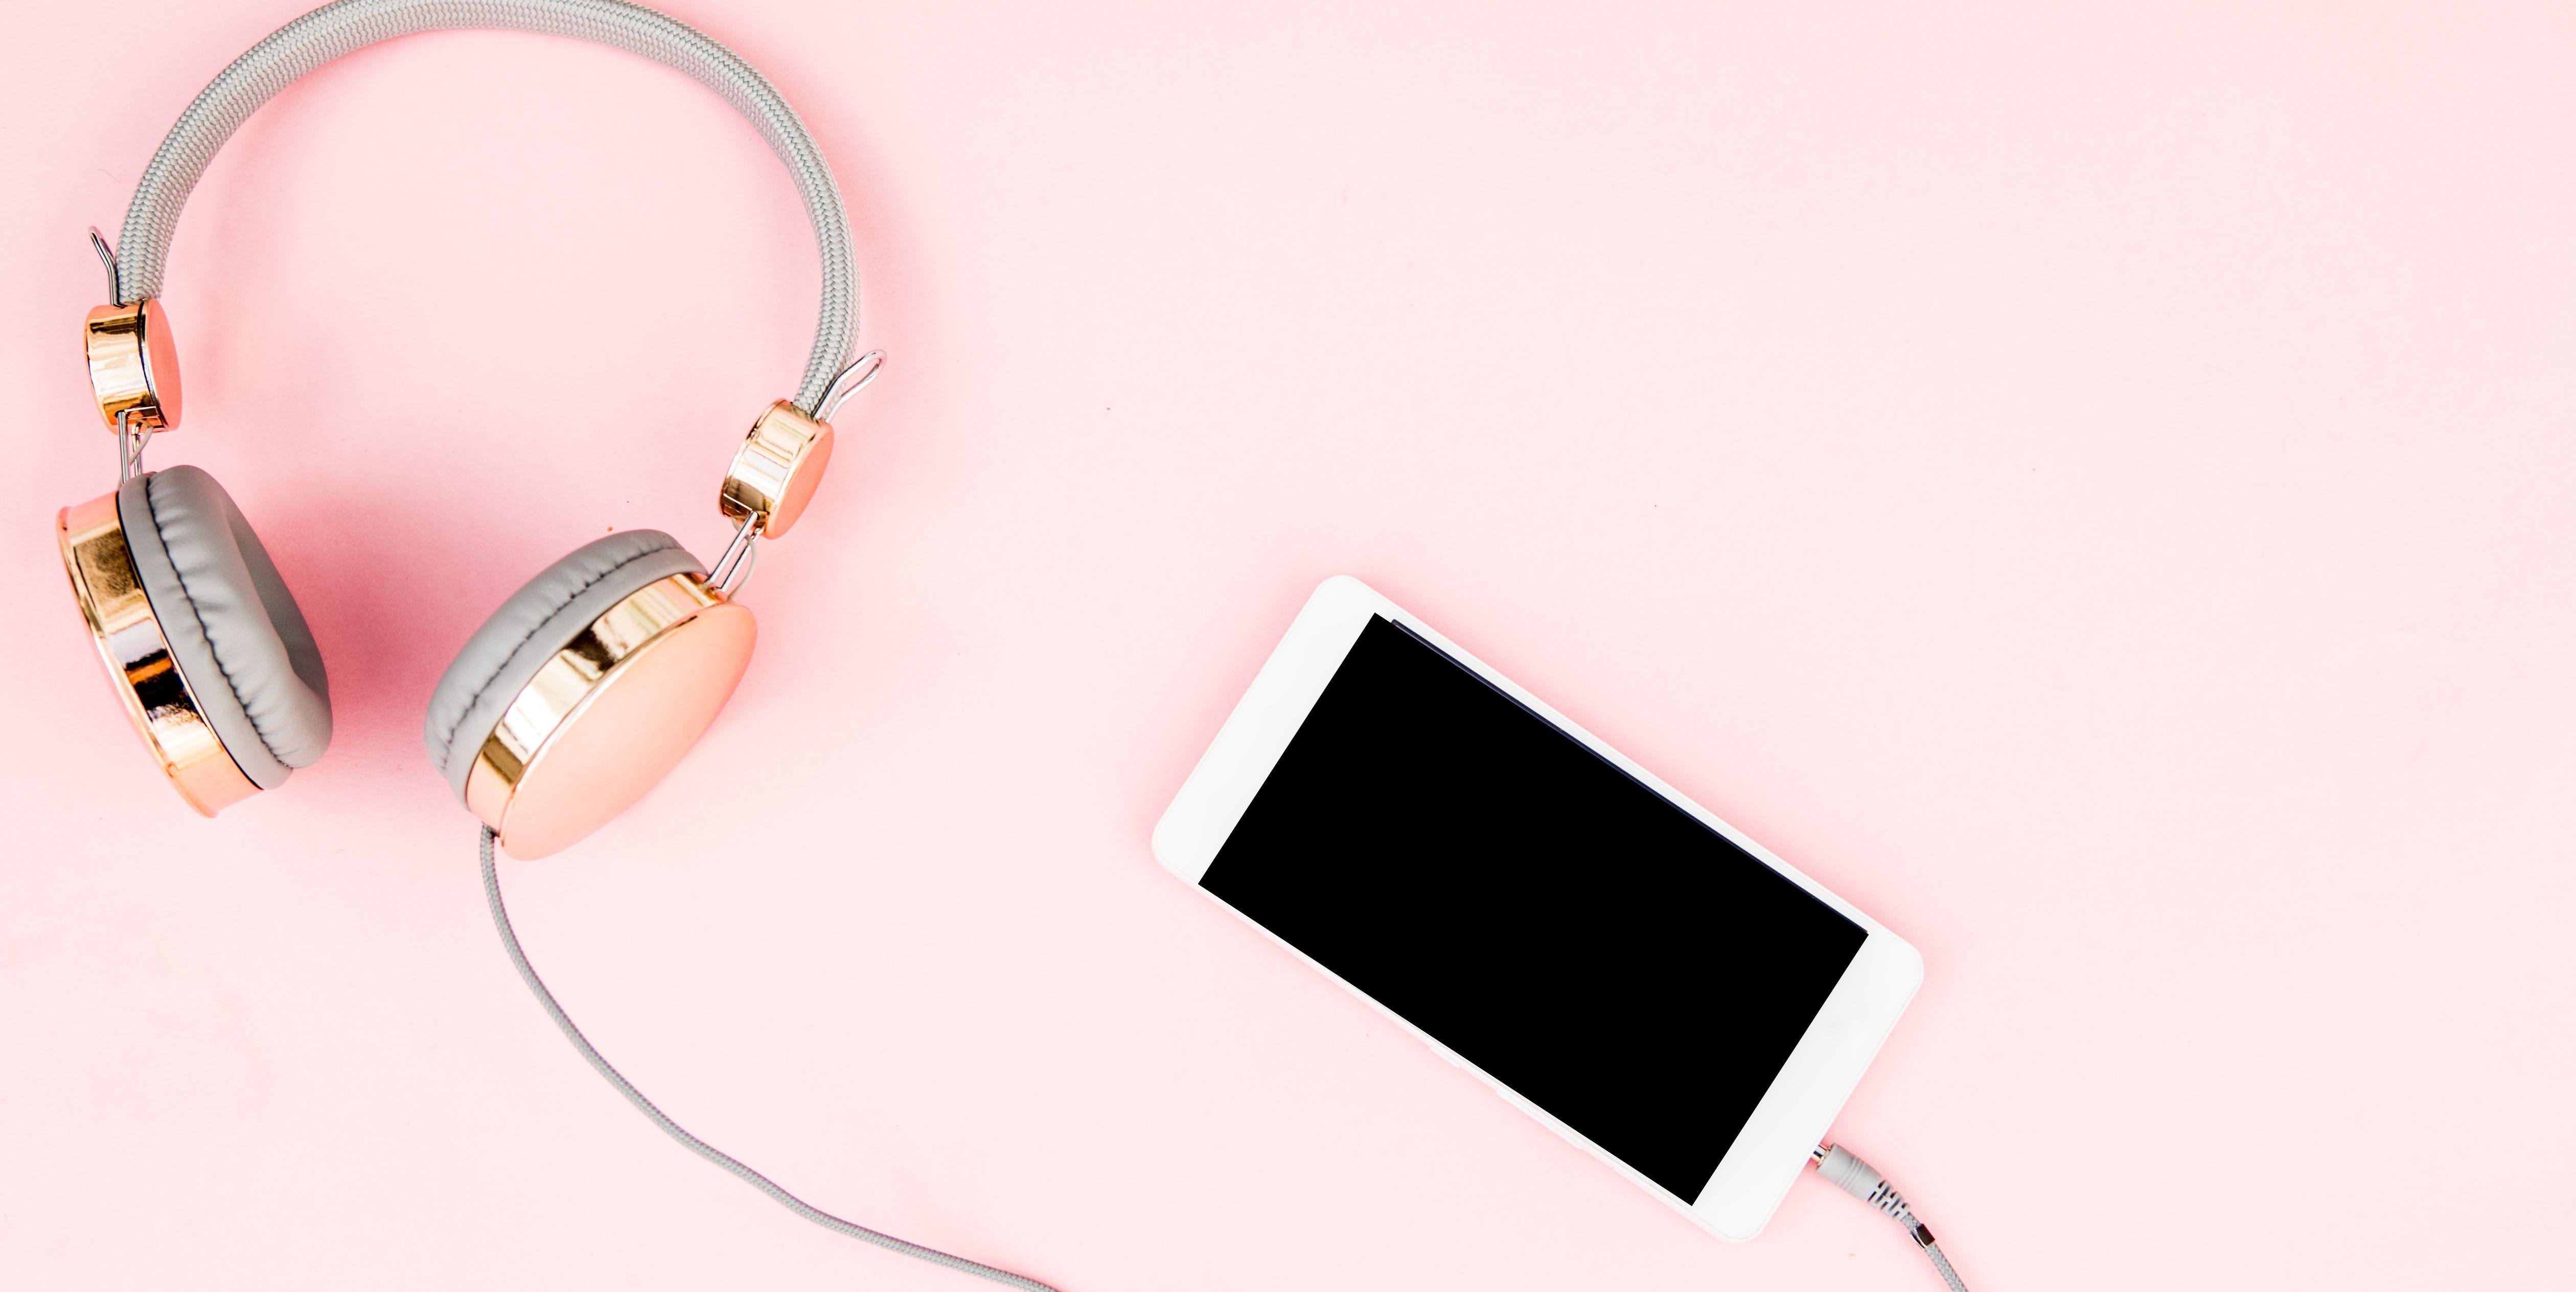 smartphone and headphones